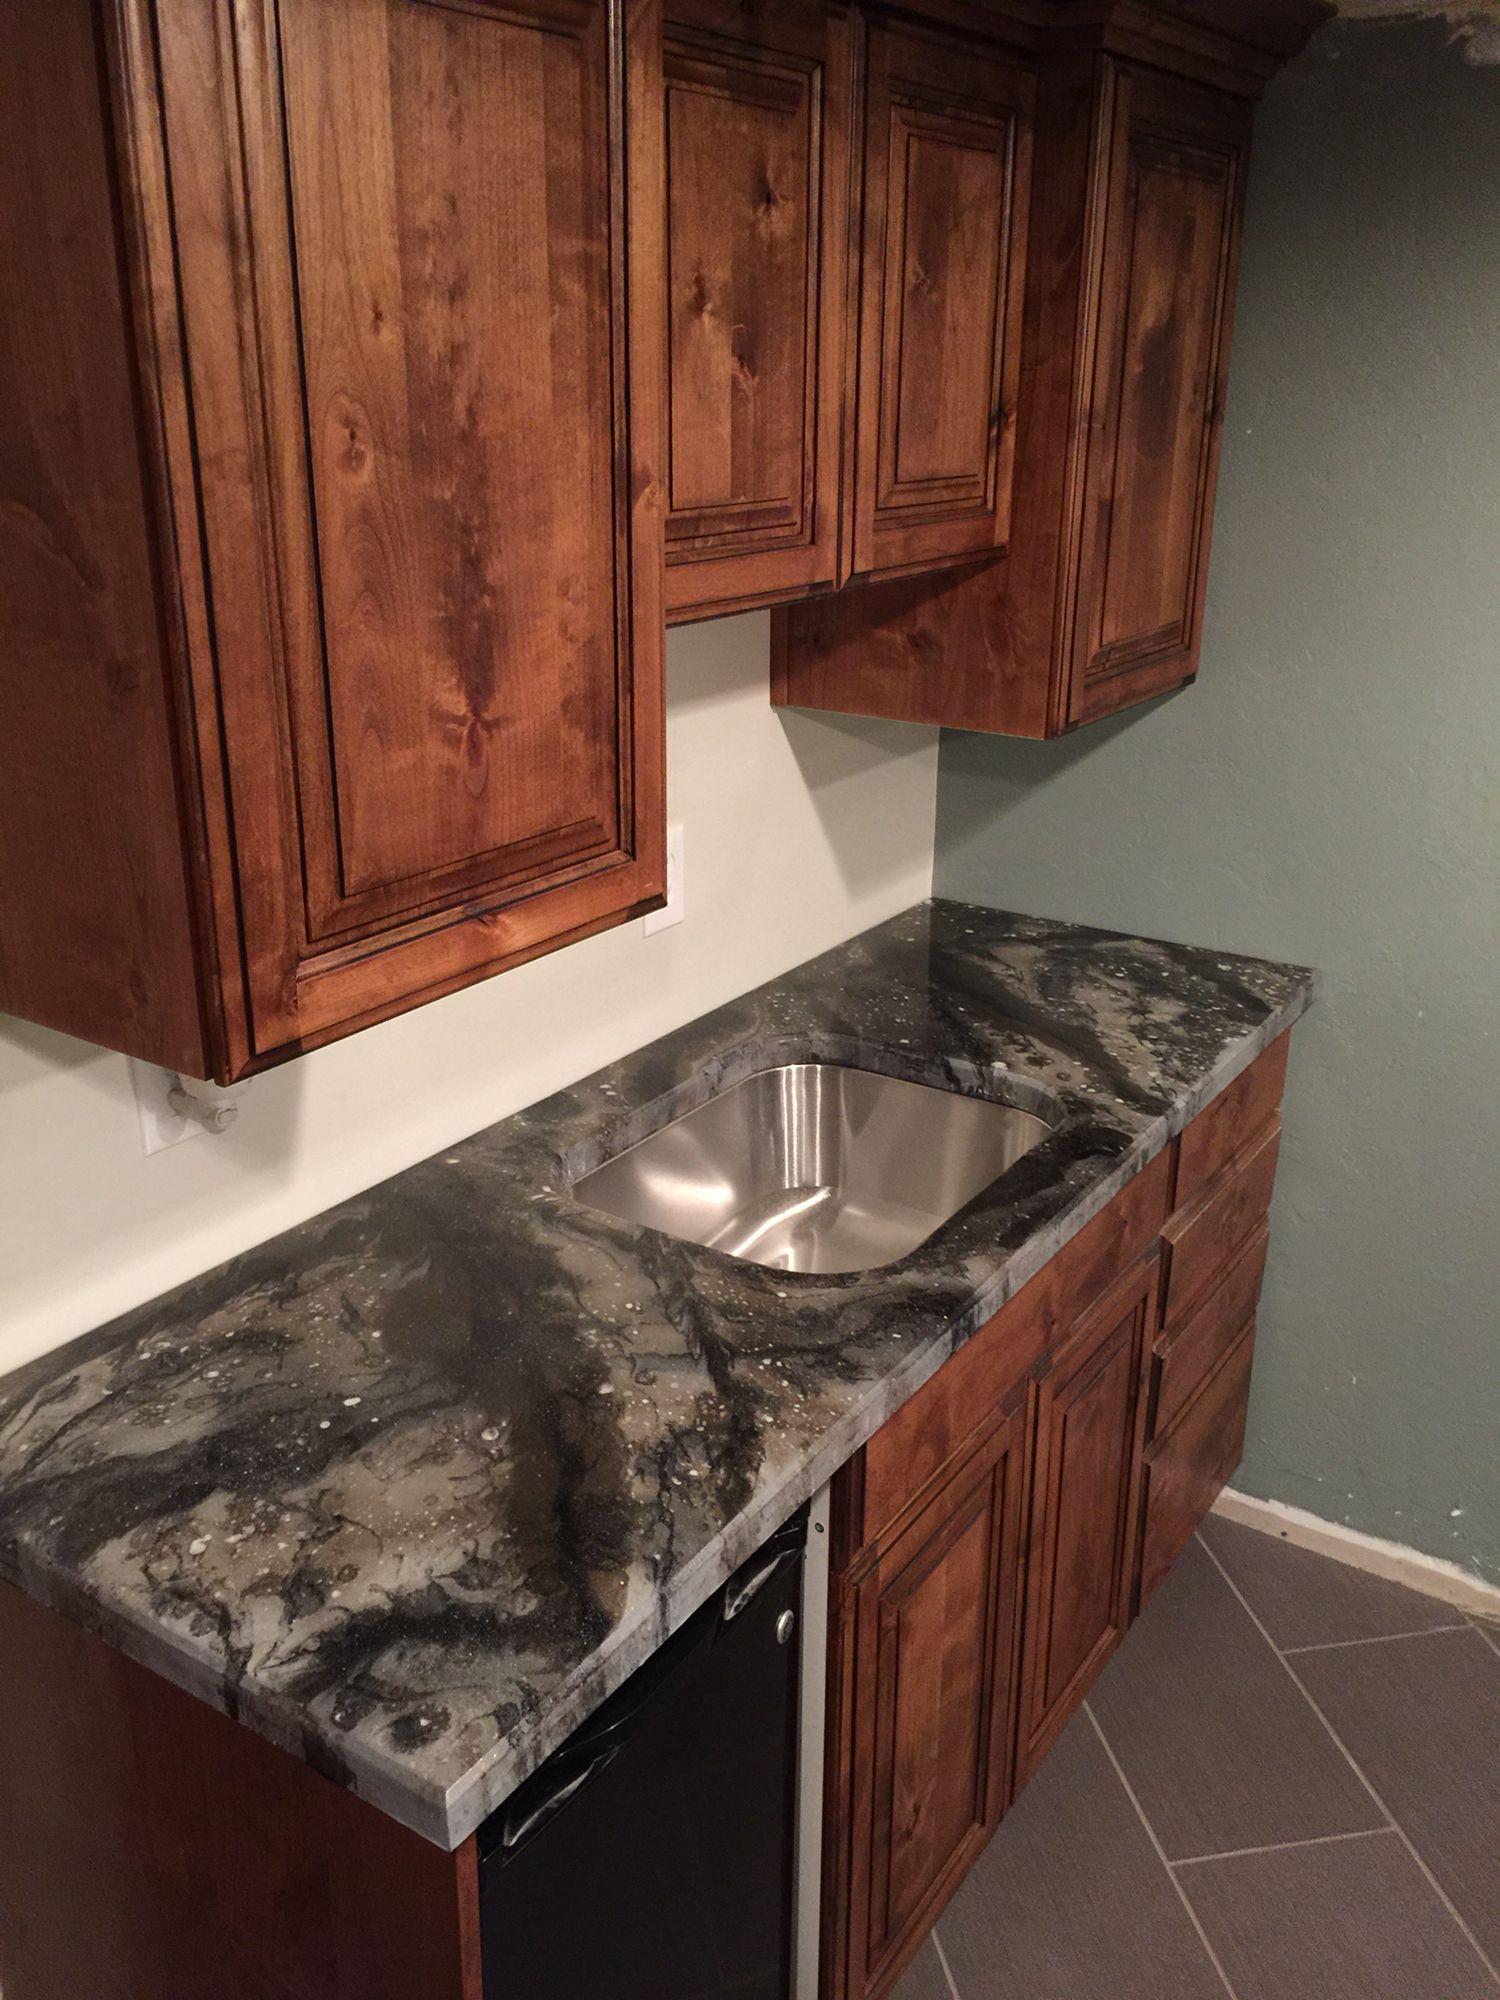 epoxy resin kitchen countertops table with drawers 22b4dbea1d6bbd13de2ccb8e5c78ec7f jpg 15002000